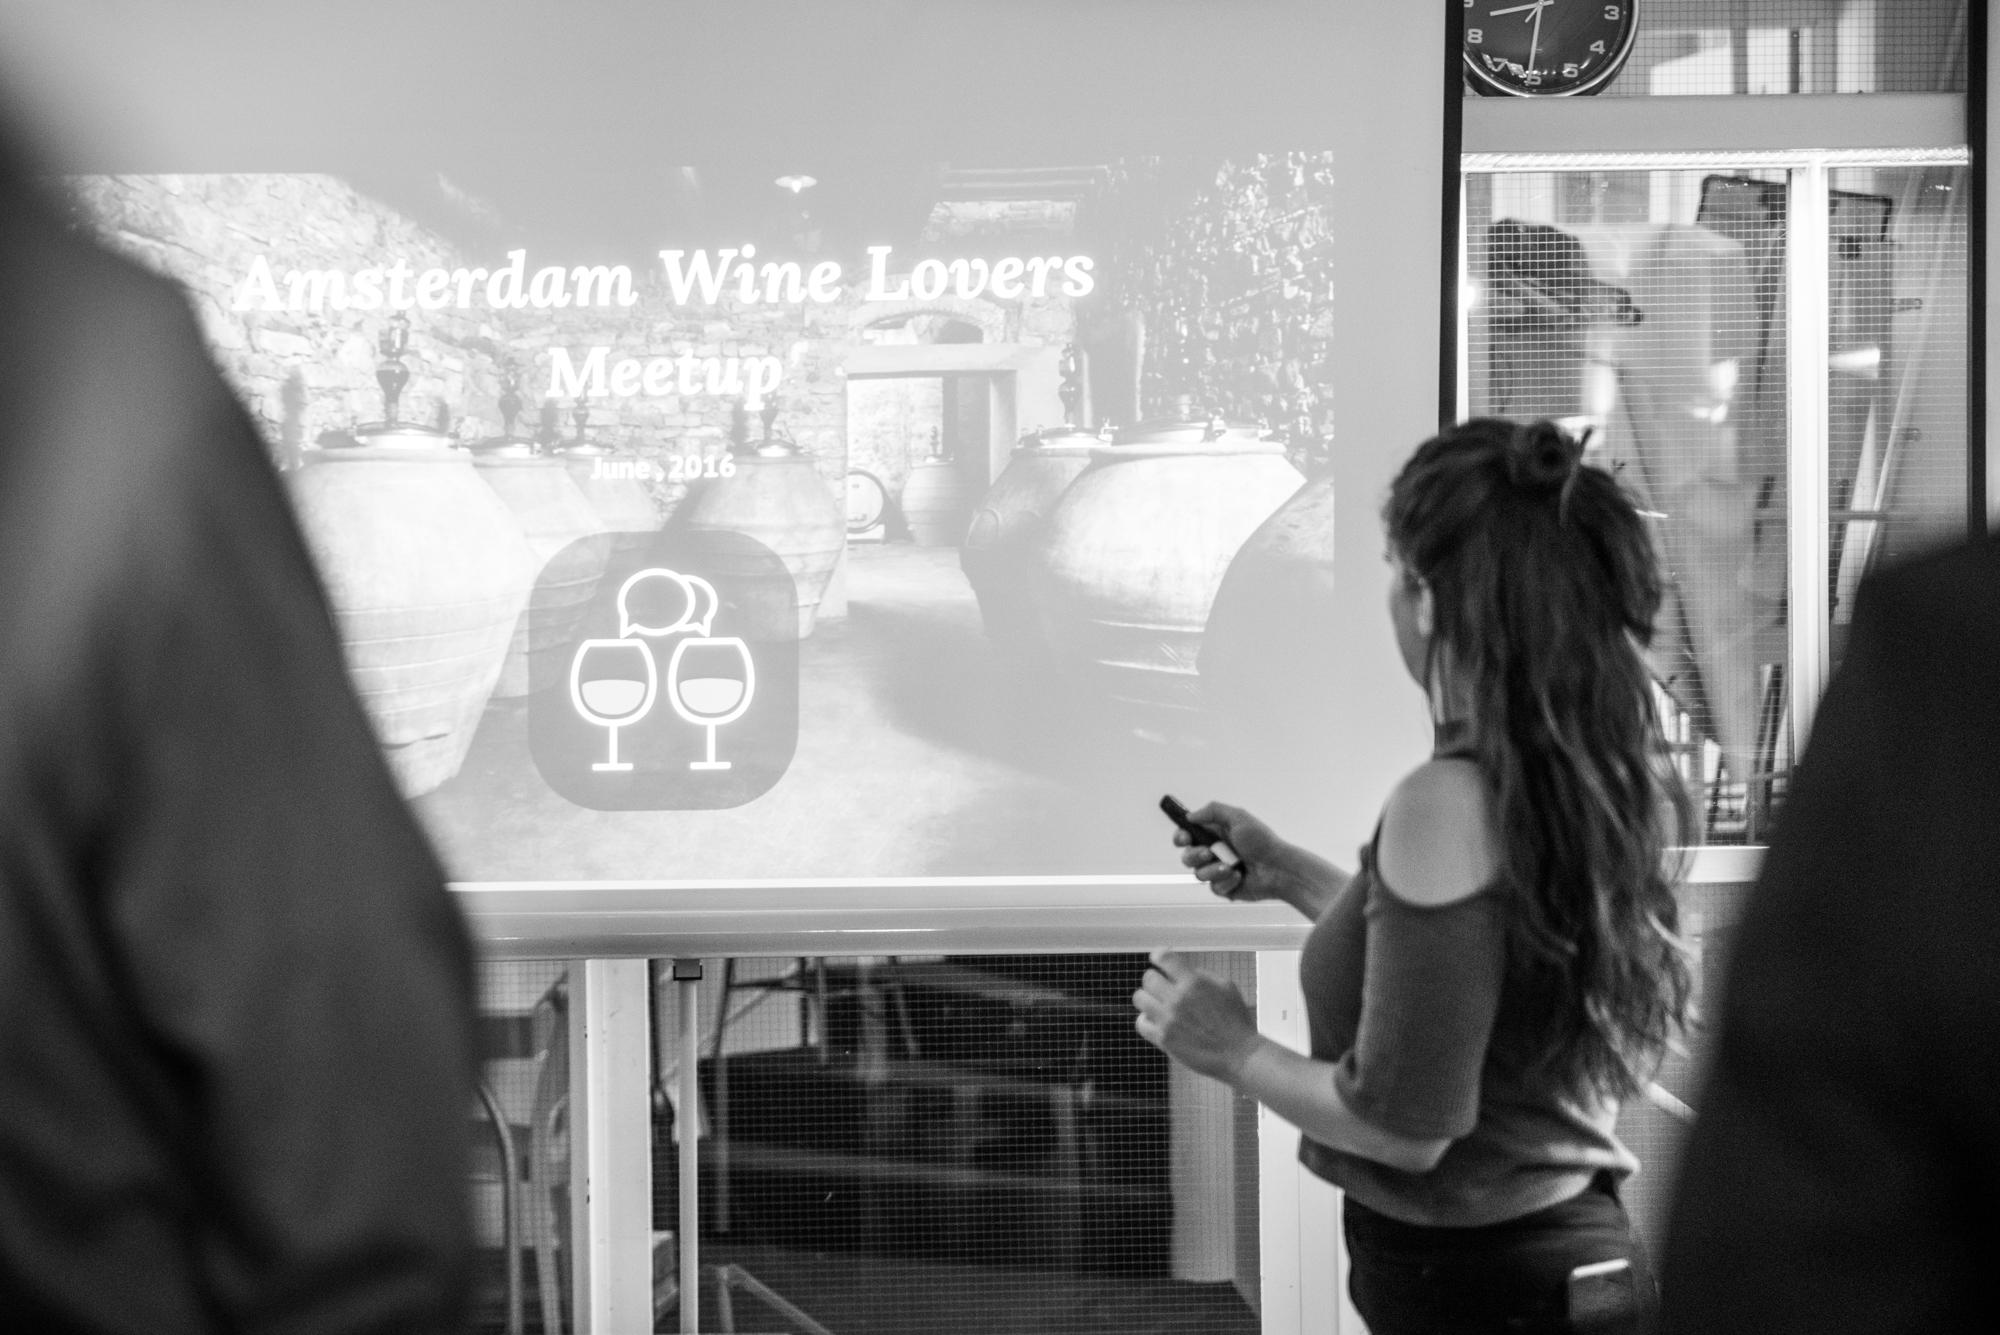 WineLoversMeetUpAmsterdam-31.jpg